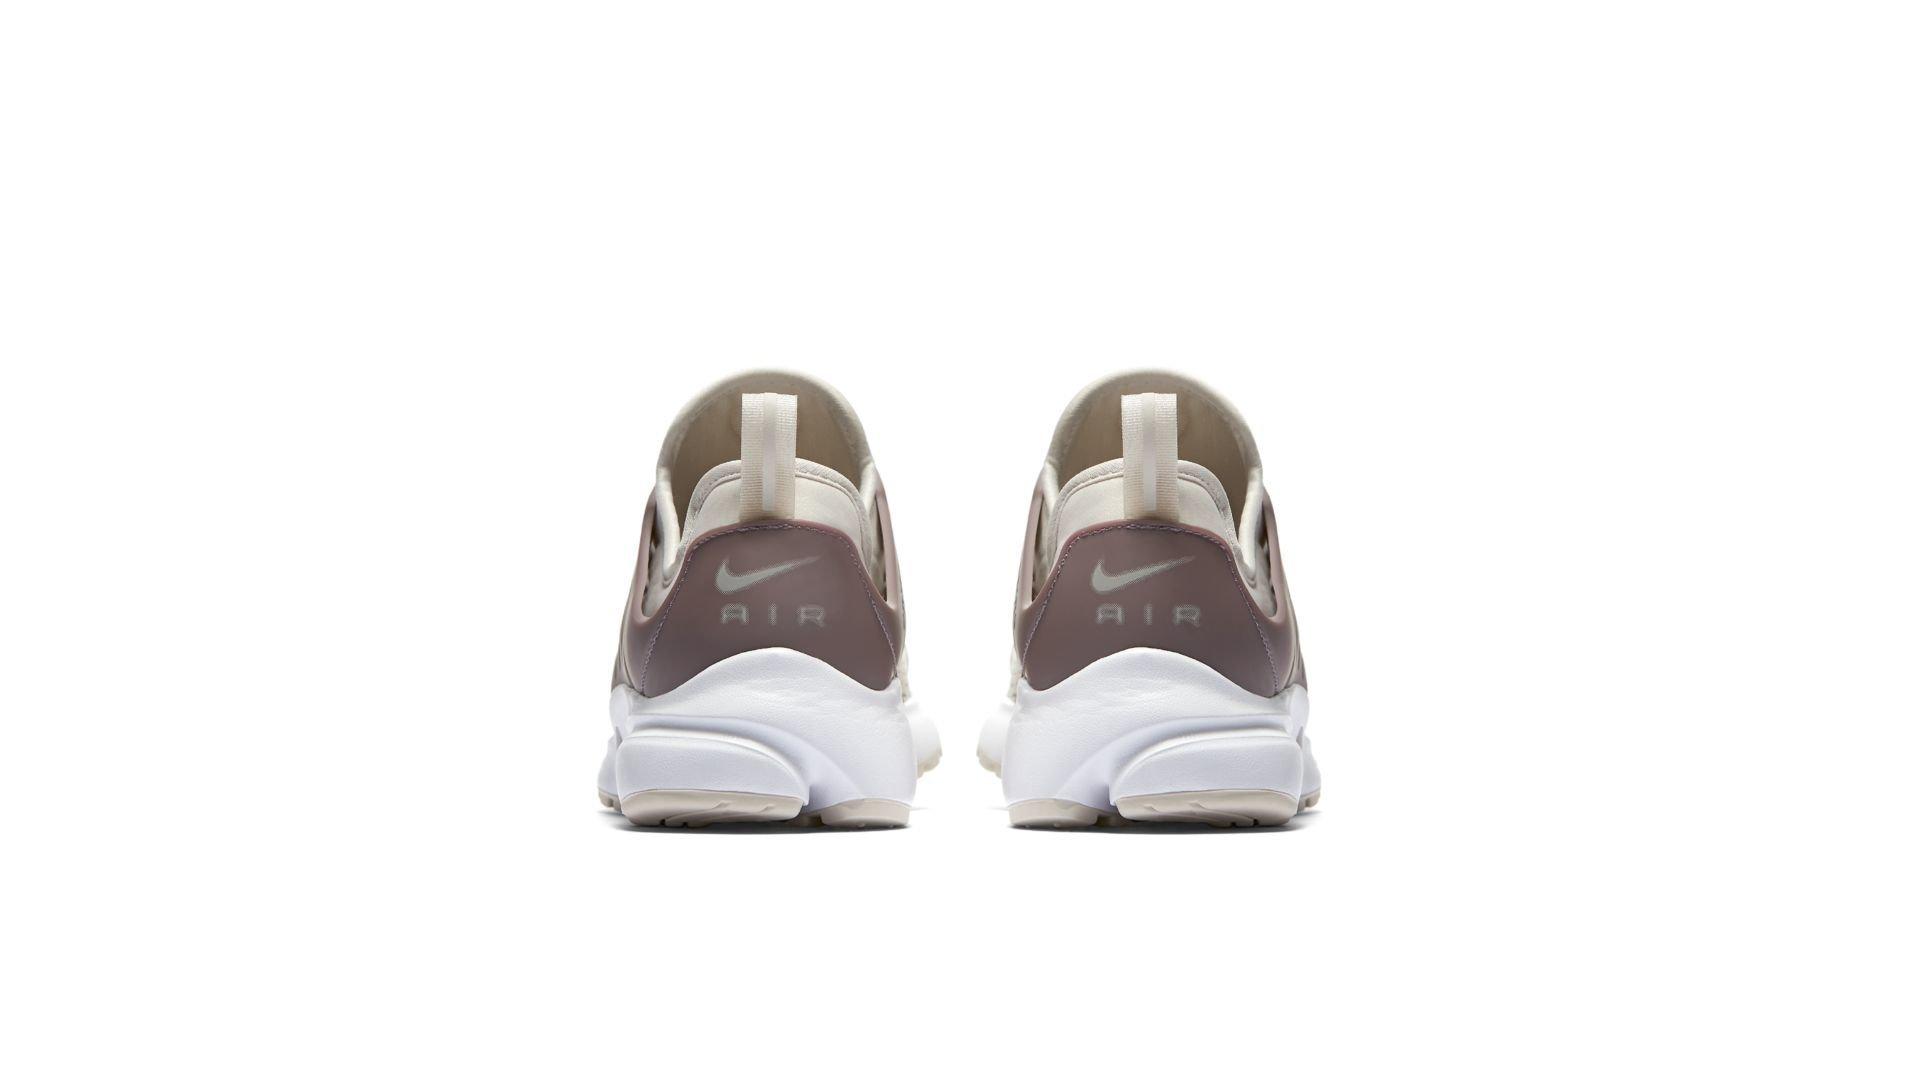 Nike Air Presto Premium Light Orewood Brown (W) (878068-102)